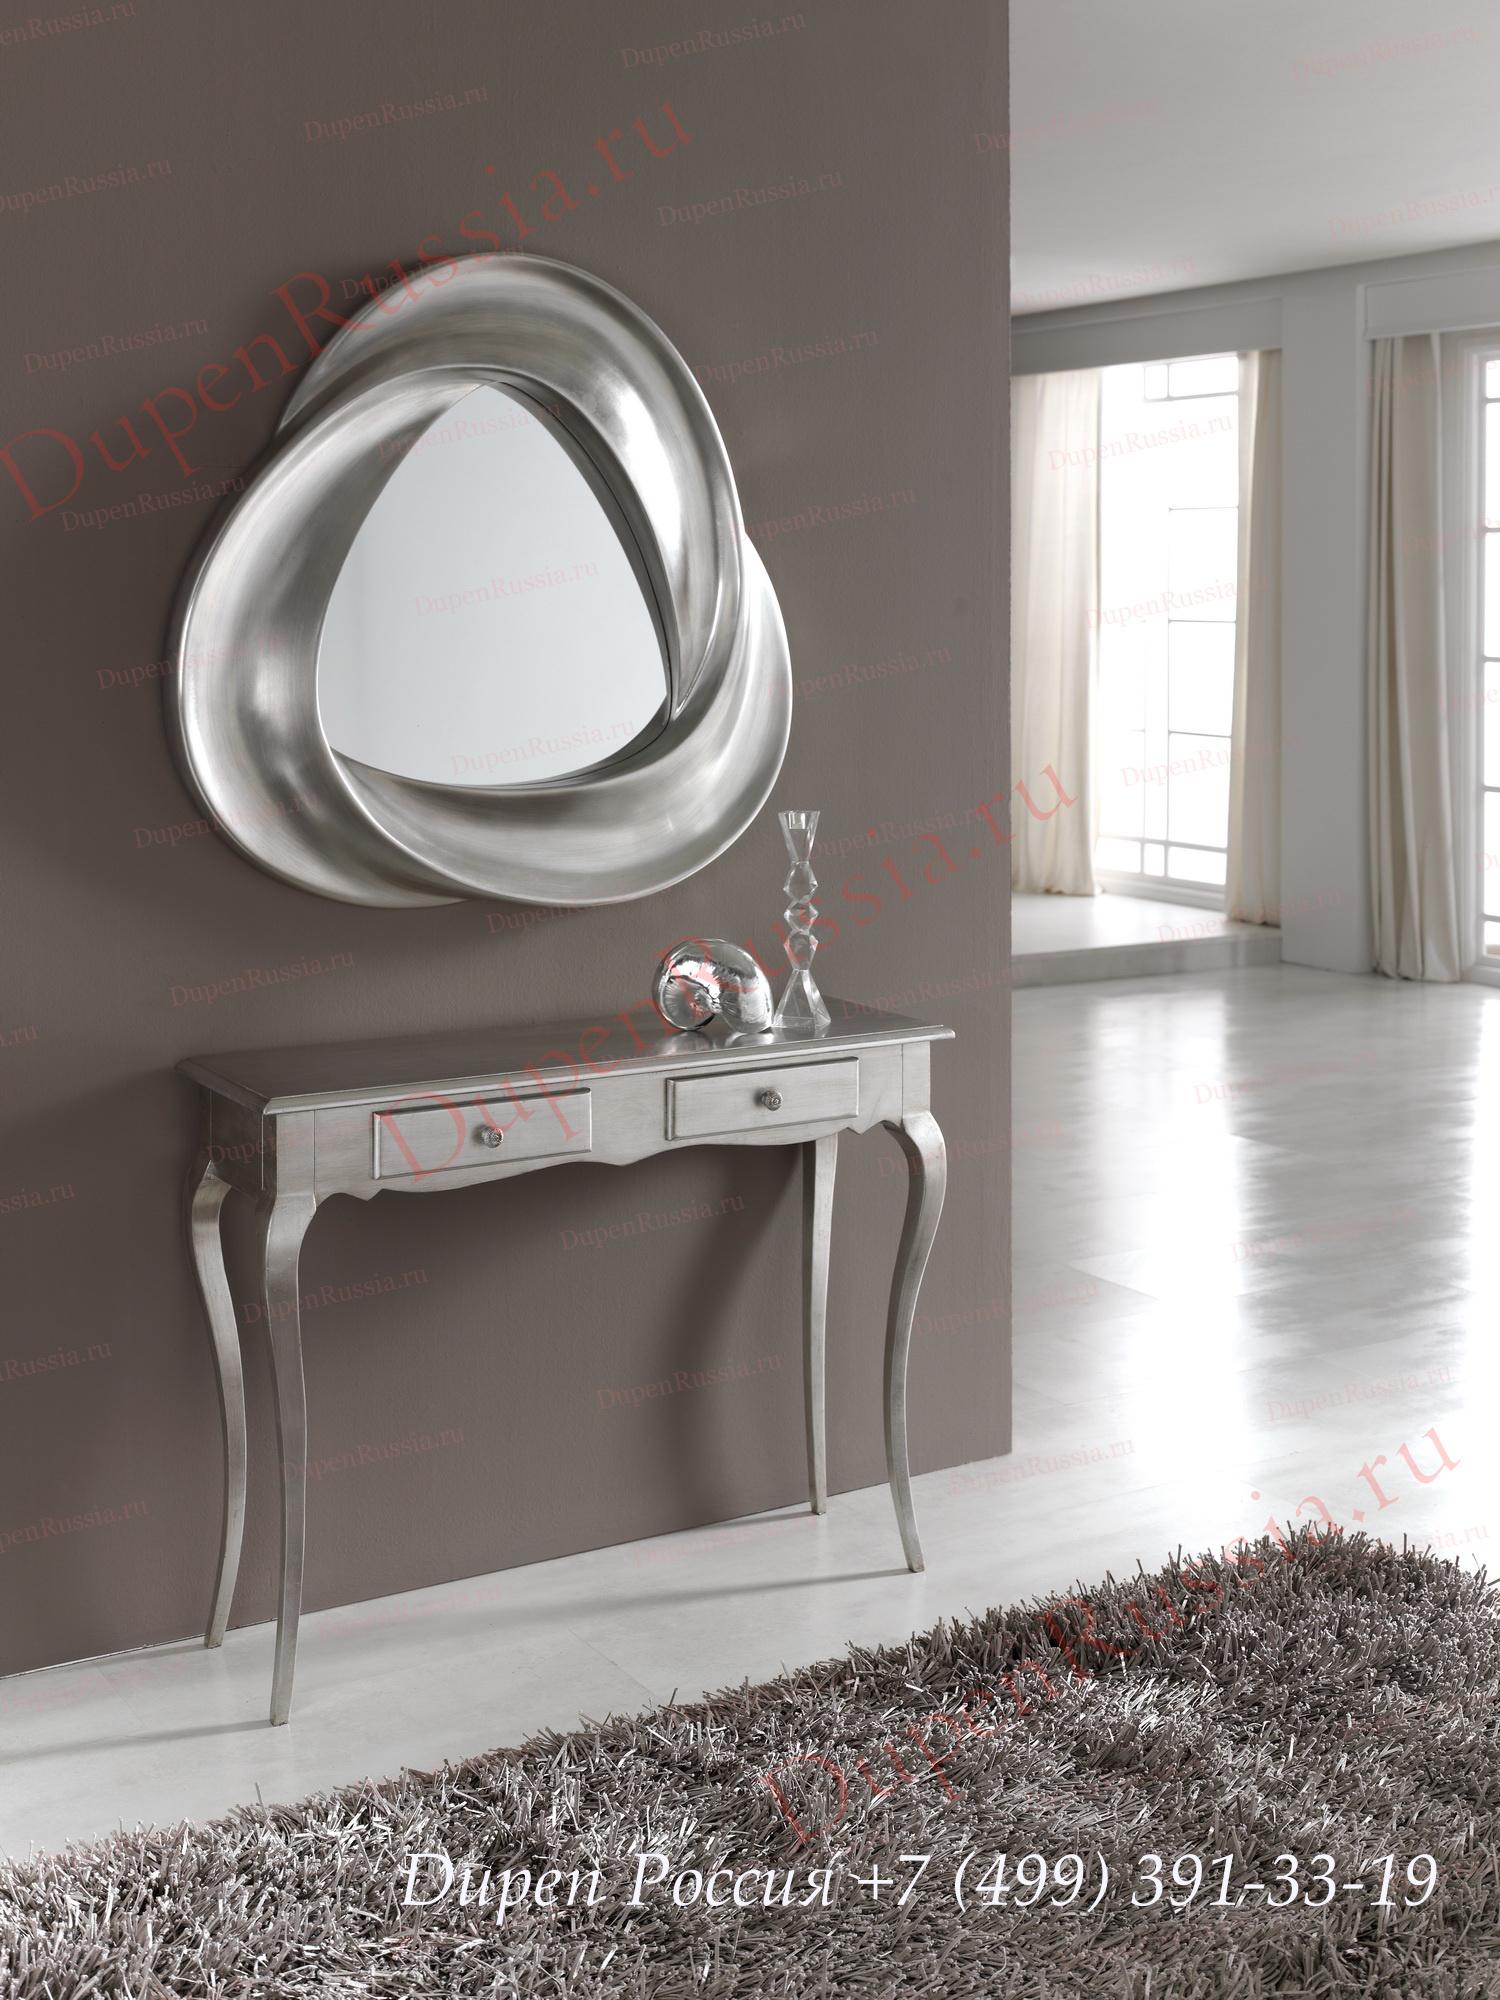 Зеркало DUPEN (Дюпен) PU178 серебро, консоль DUPEN M46-A